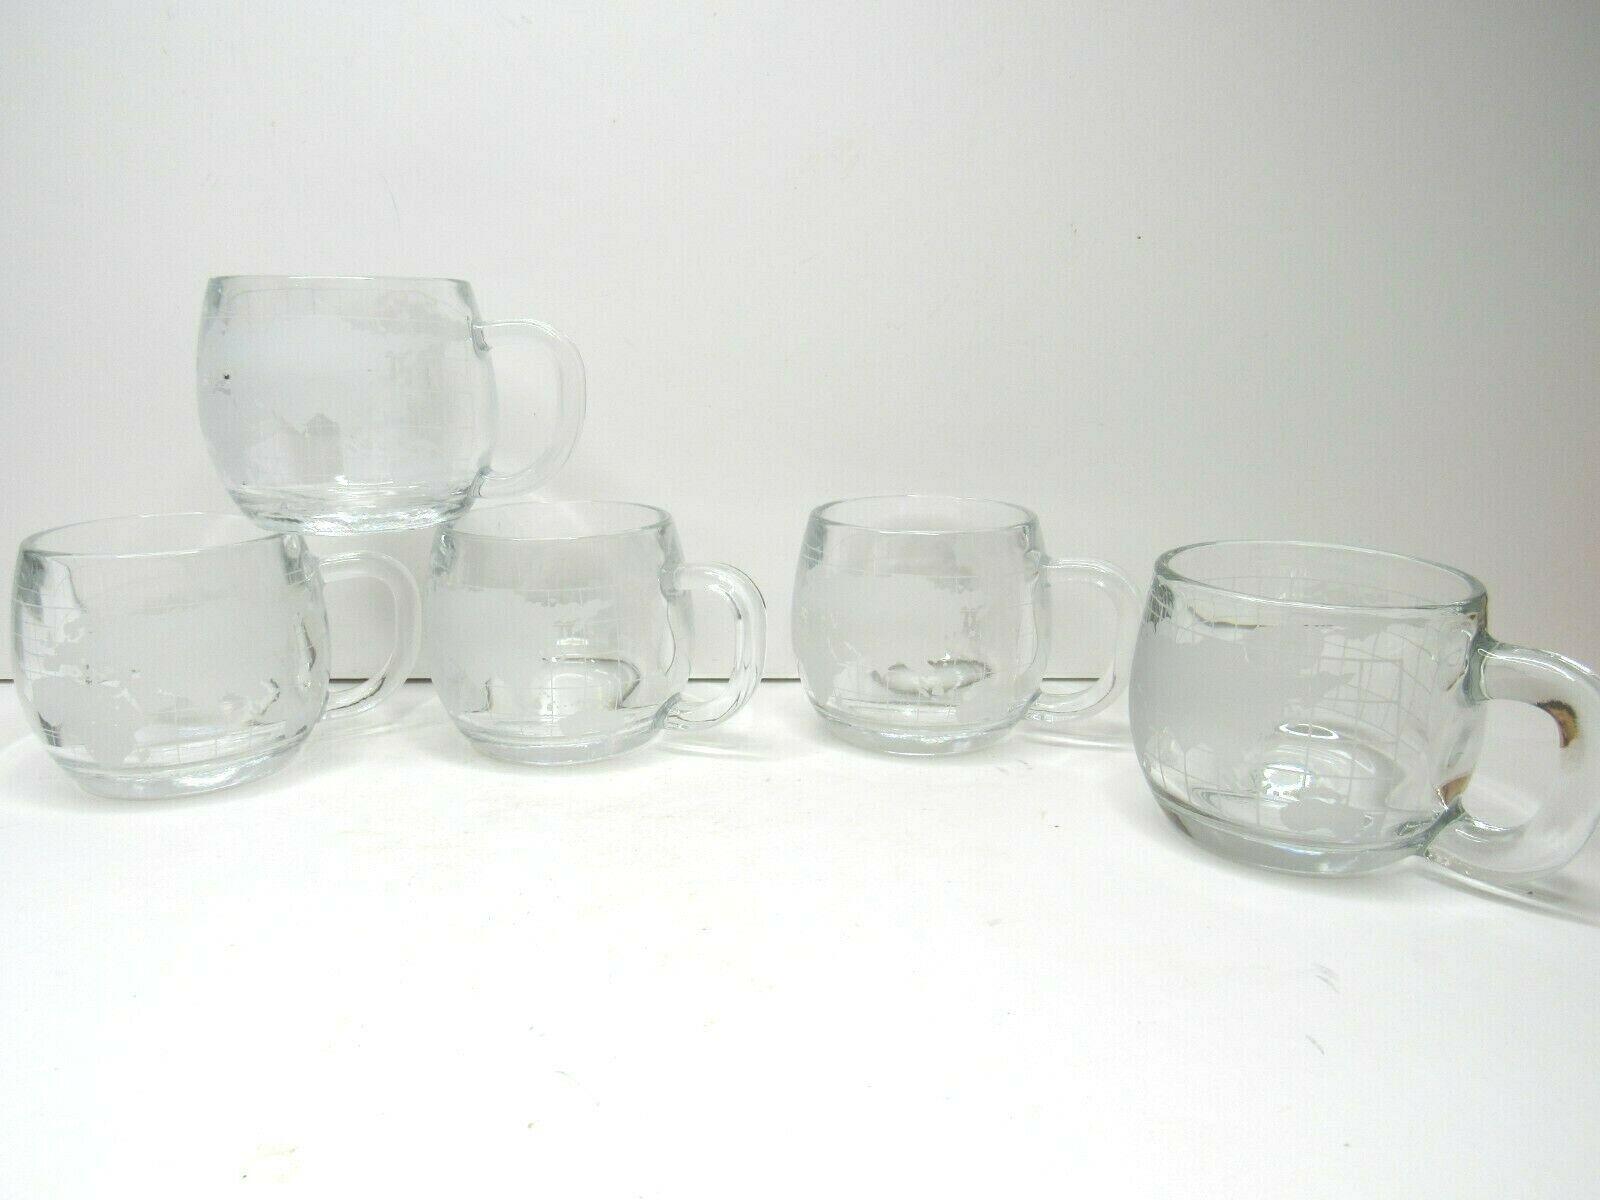 5 VTG Nestle Nescafe Etched Clear Heavy Glass World Globe Coffee Mugs Tea Cups  - $24.42